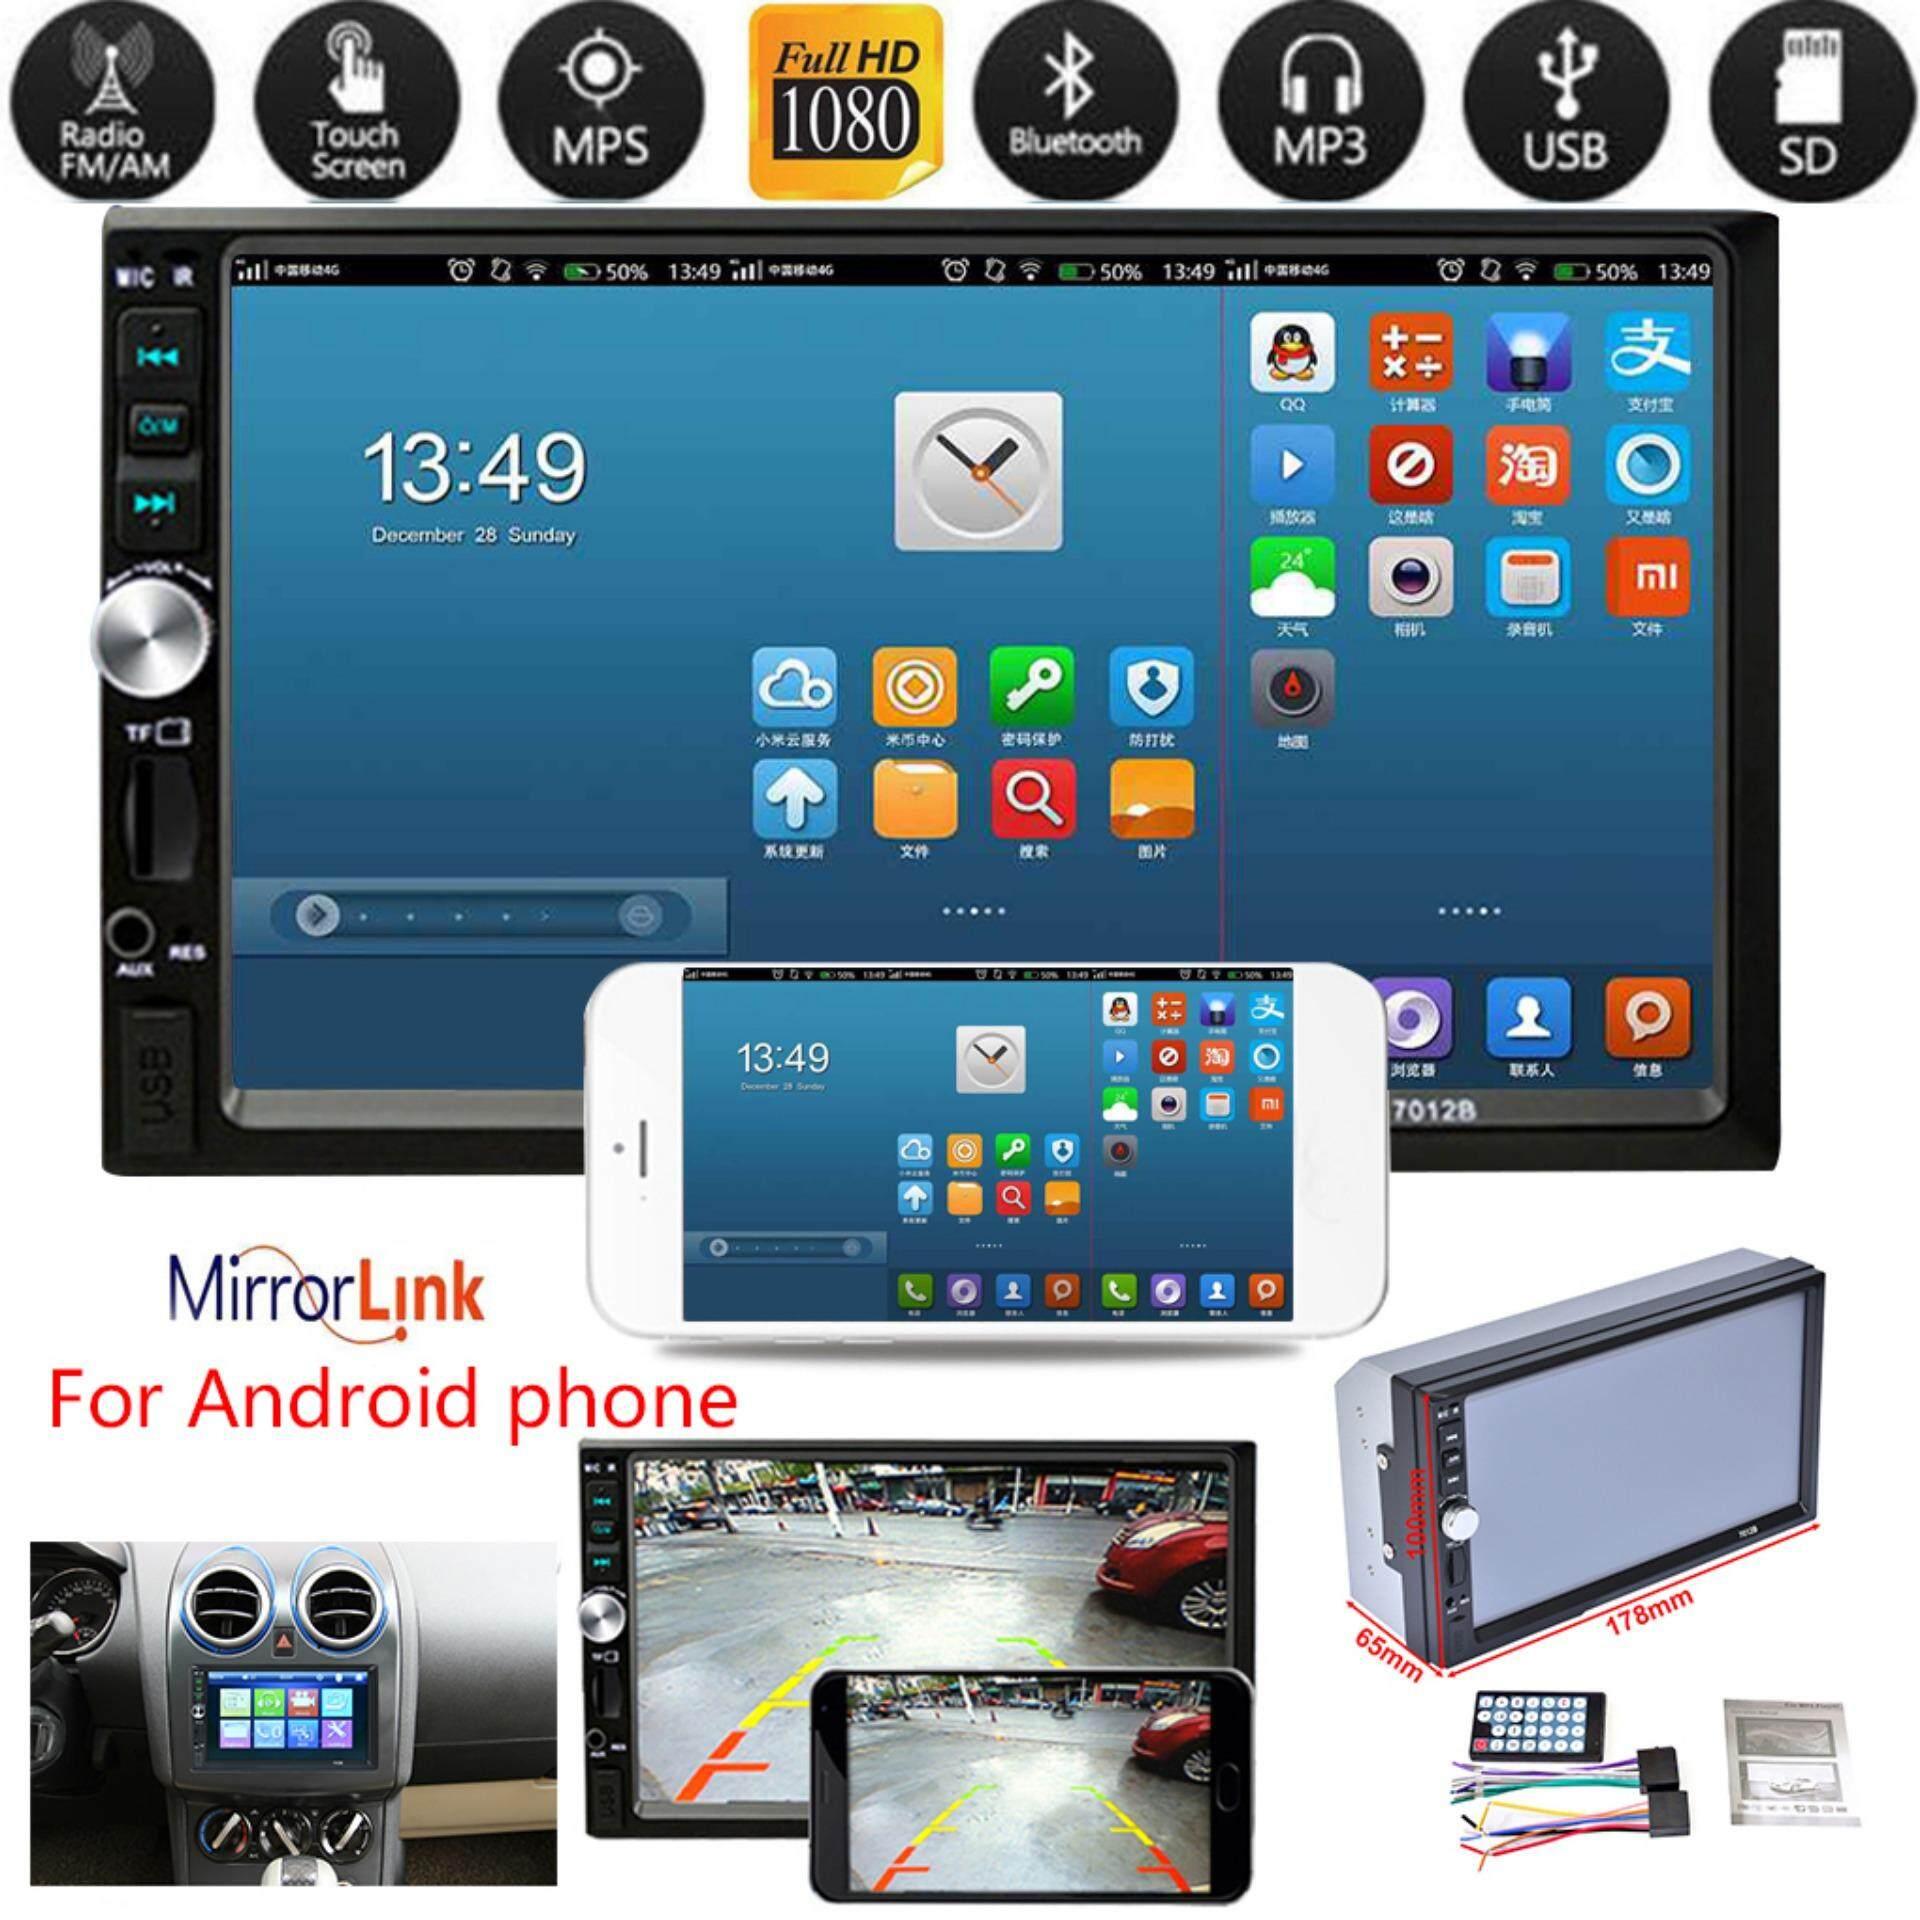 2Din 7012B MP3 MP5 Player FM Mobil Radio Audio Stereo USB Musik Digital Layar Sentuh Bluetooth AUX Input Pemain